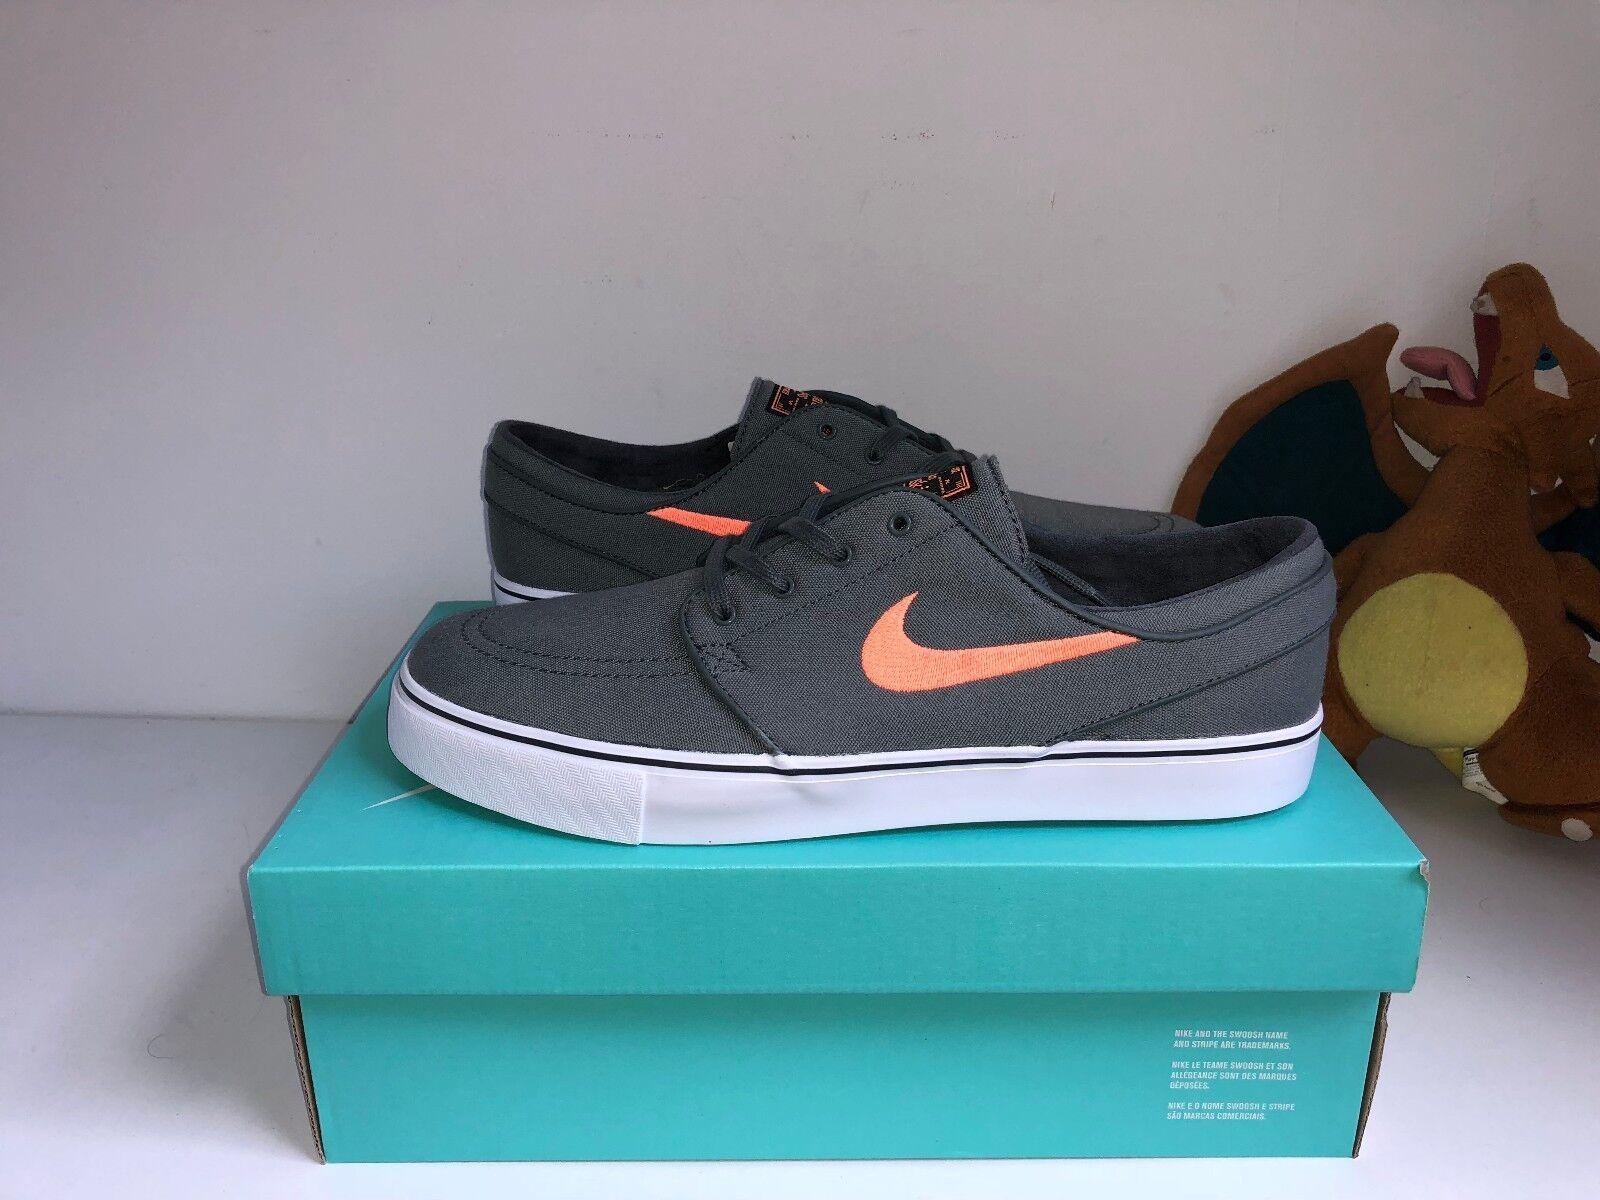 Nike Stefan Janoski Scarpe Da Ginnastica-Grigio/Arancione/Verde [Us 10-]